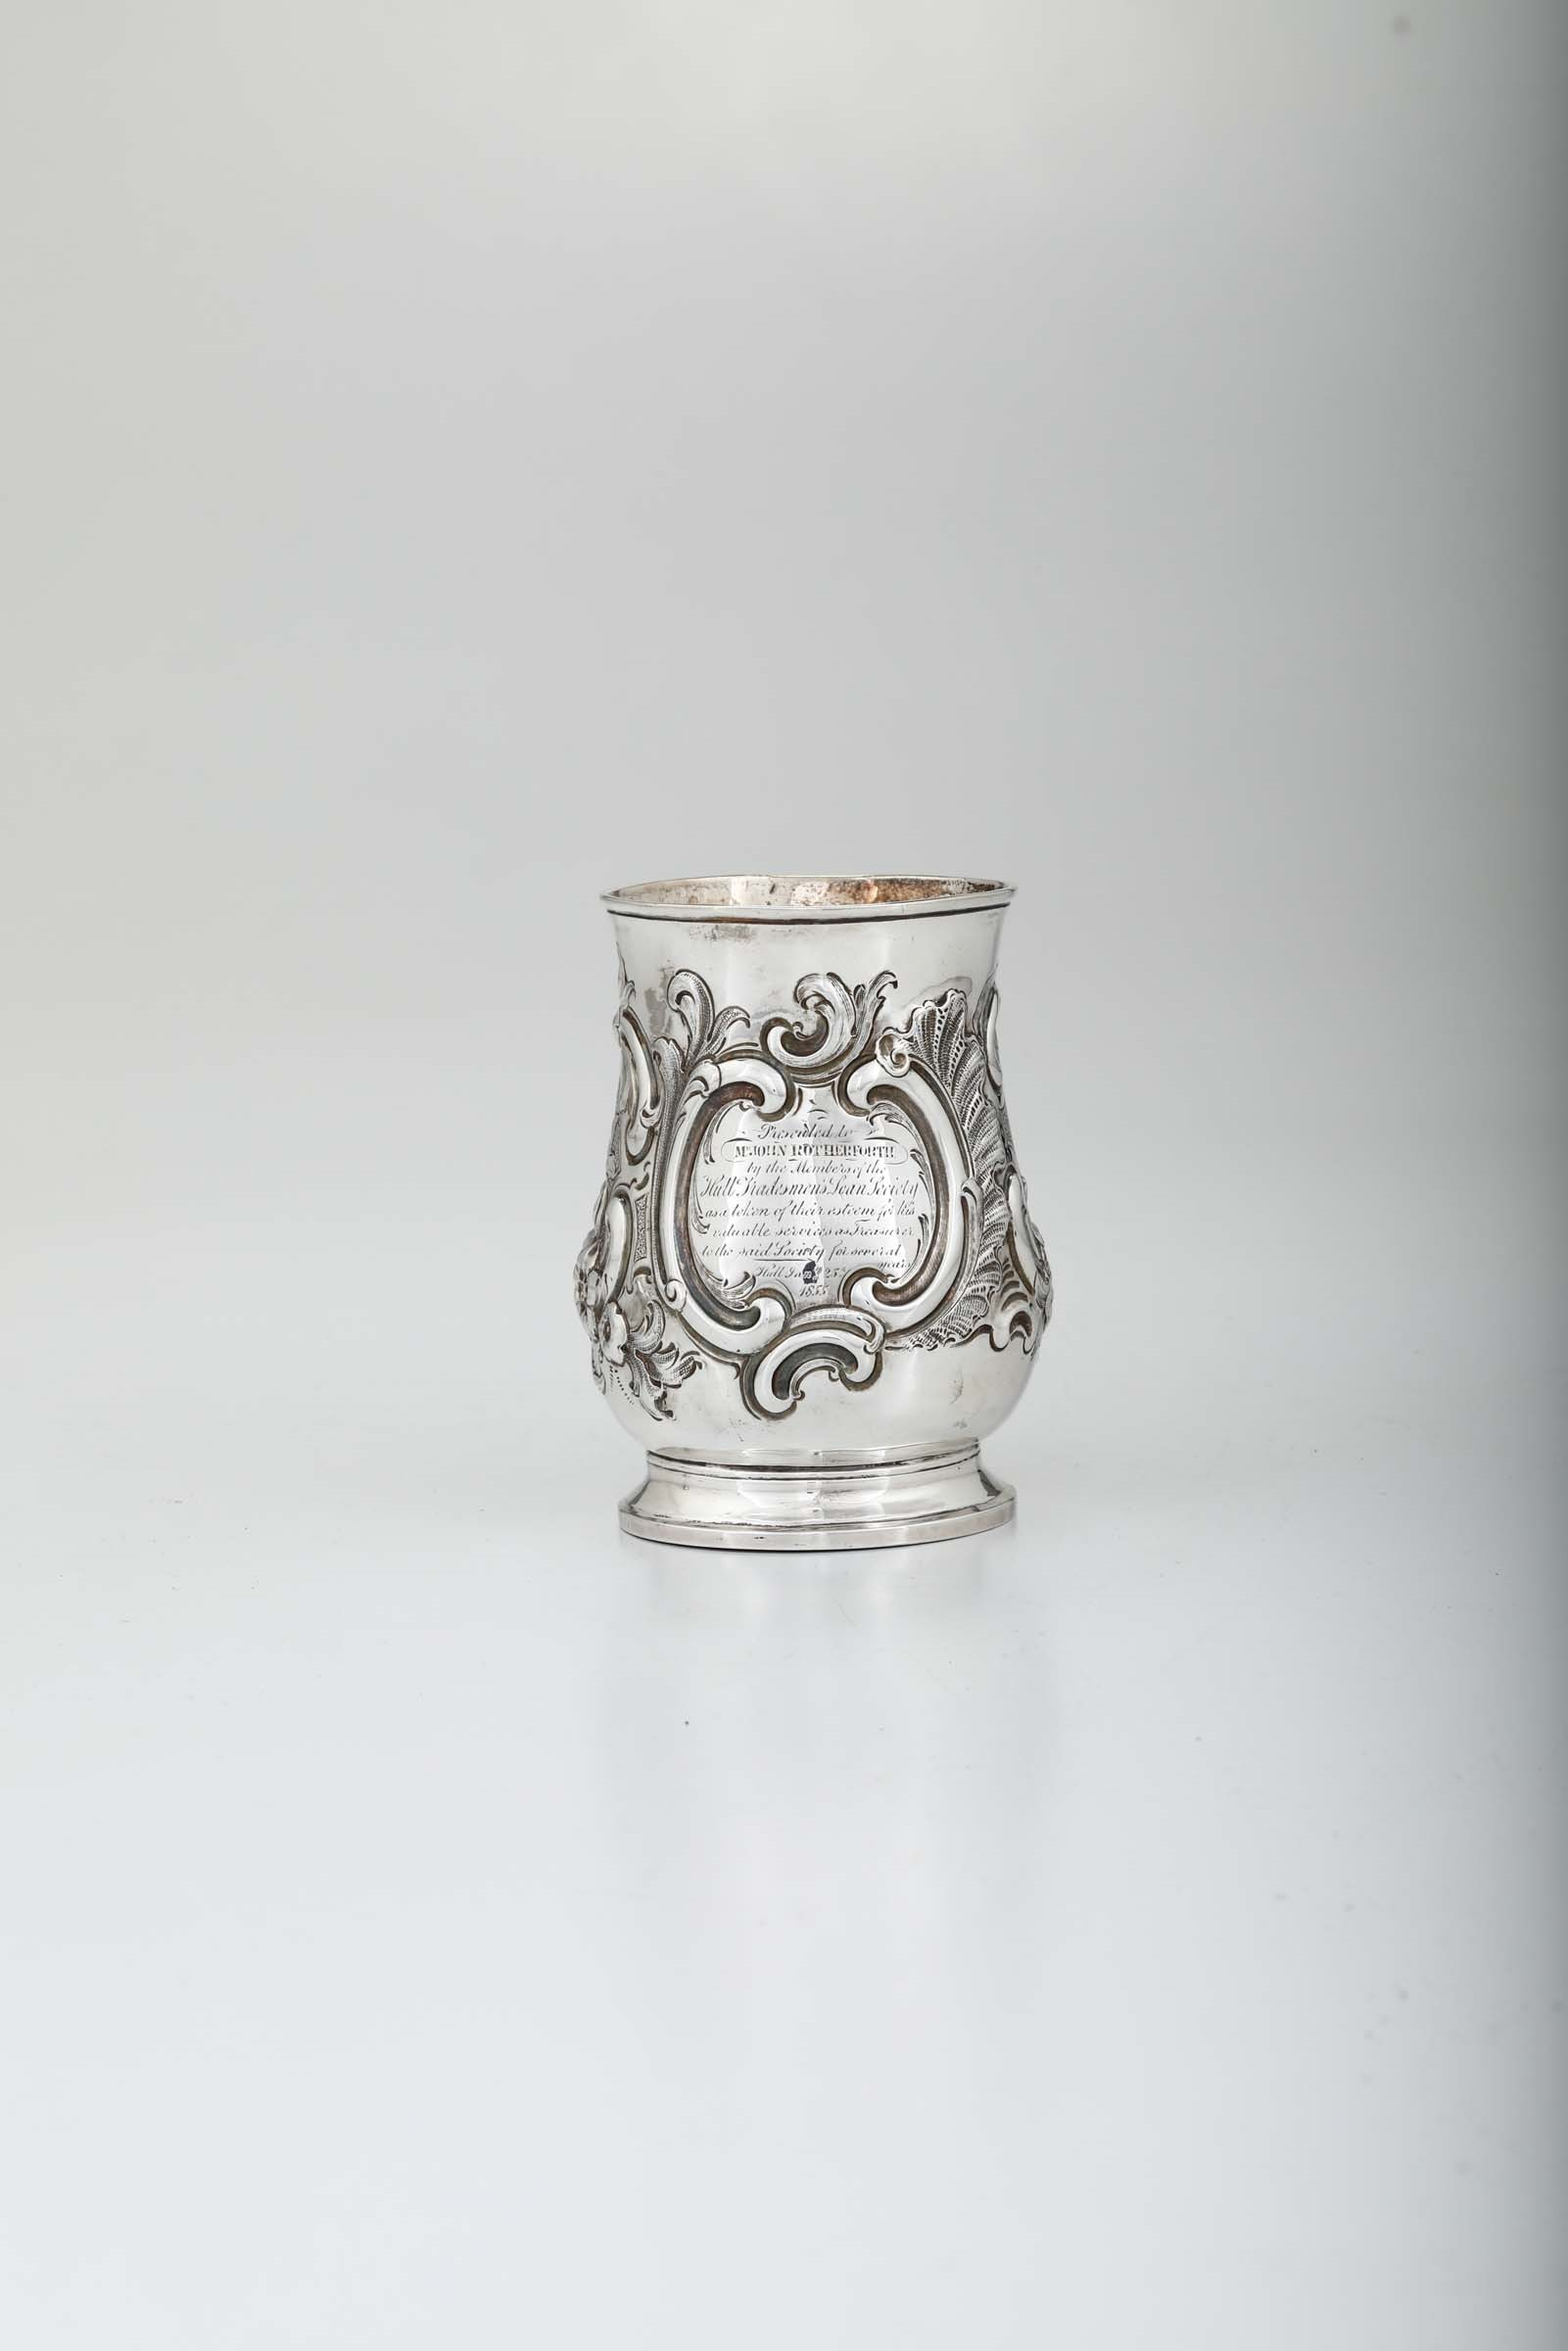 Lot 6 - A silver tankard, London, 1758 - H 12.5cm, 290gr -